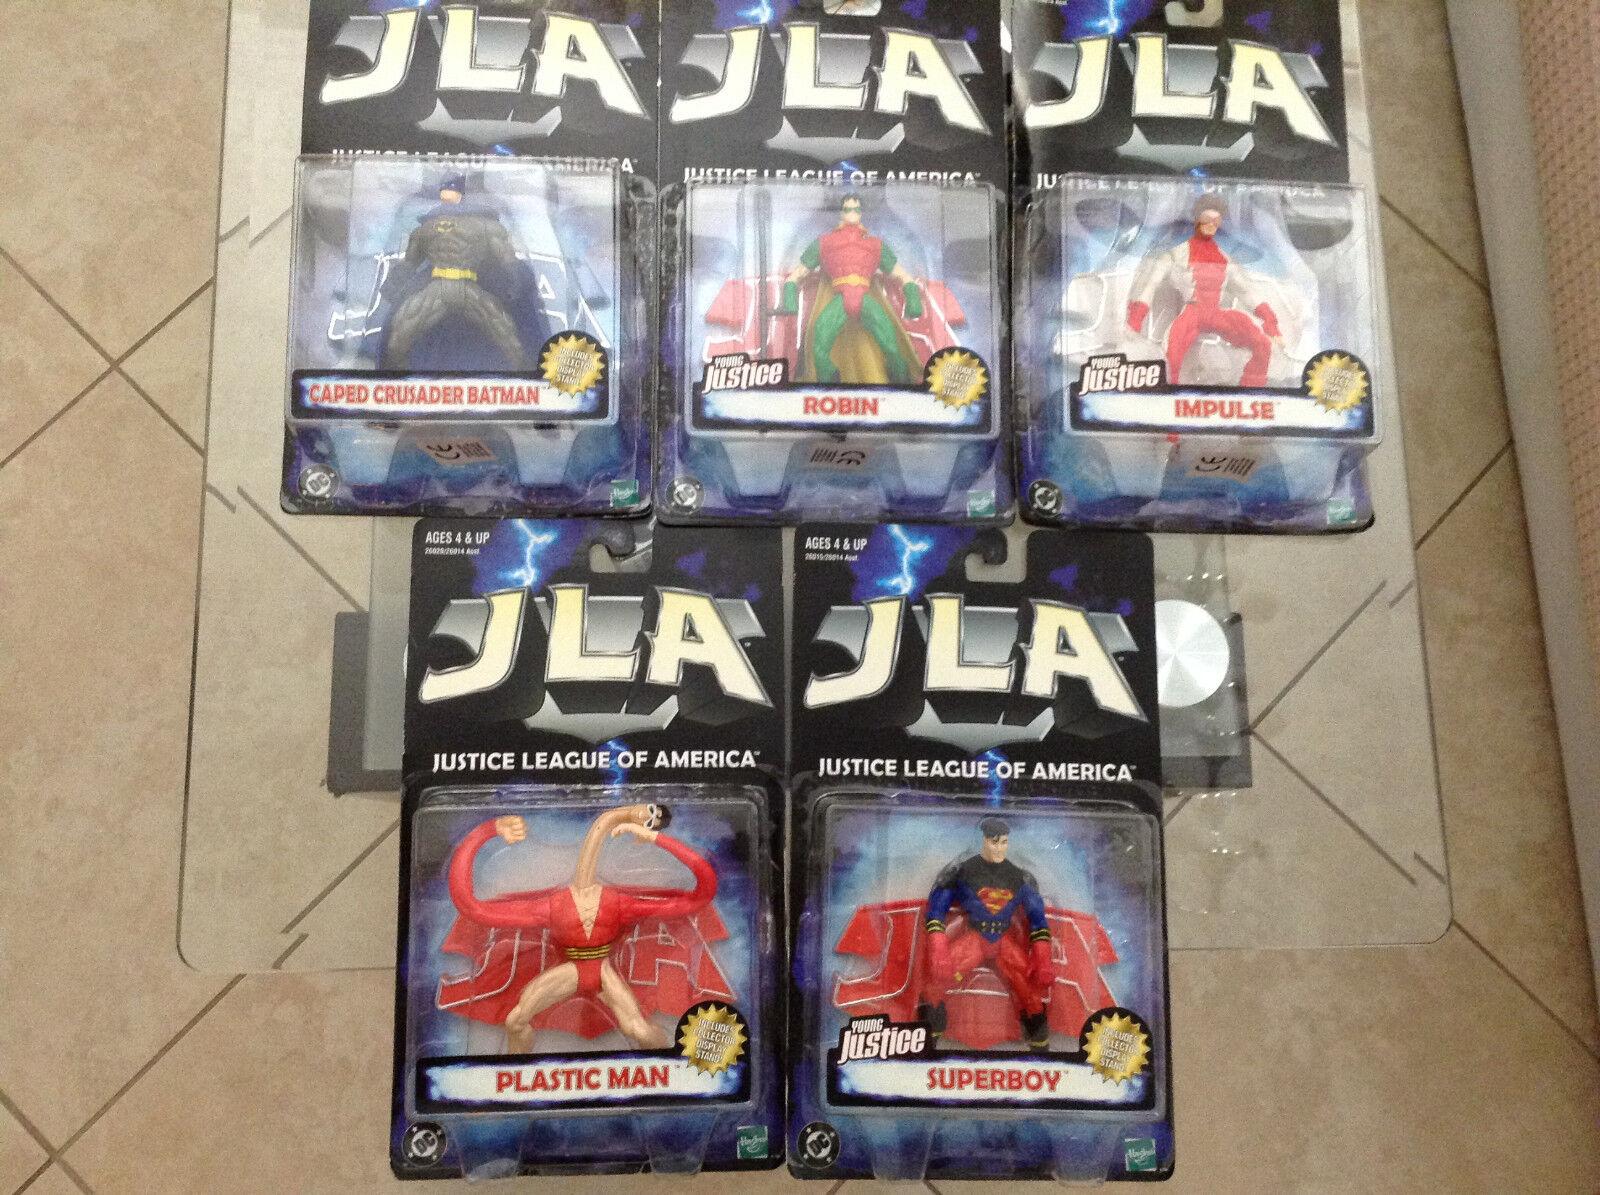 JLA FIGURE SET OF 5 DC KENNER OPENED SUPERBOY ROBIN IMPULSE BATMAN PLASTIC MAN 1